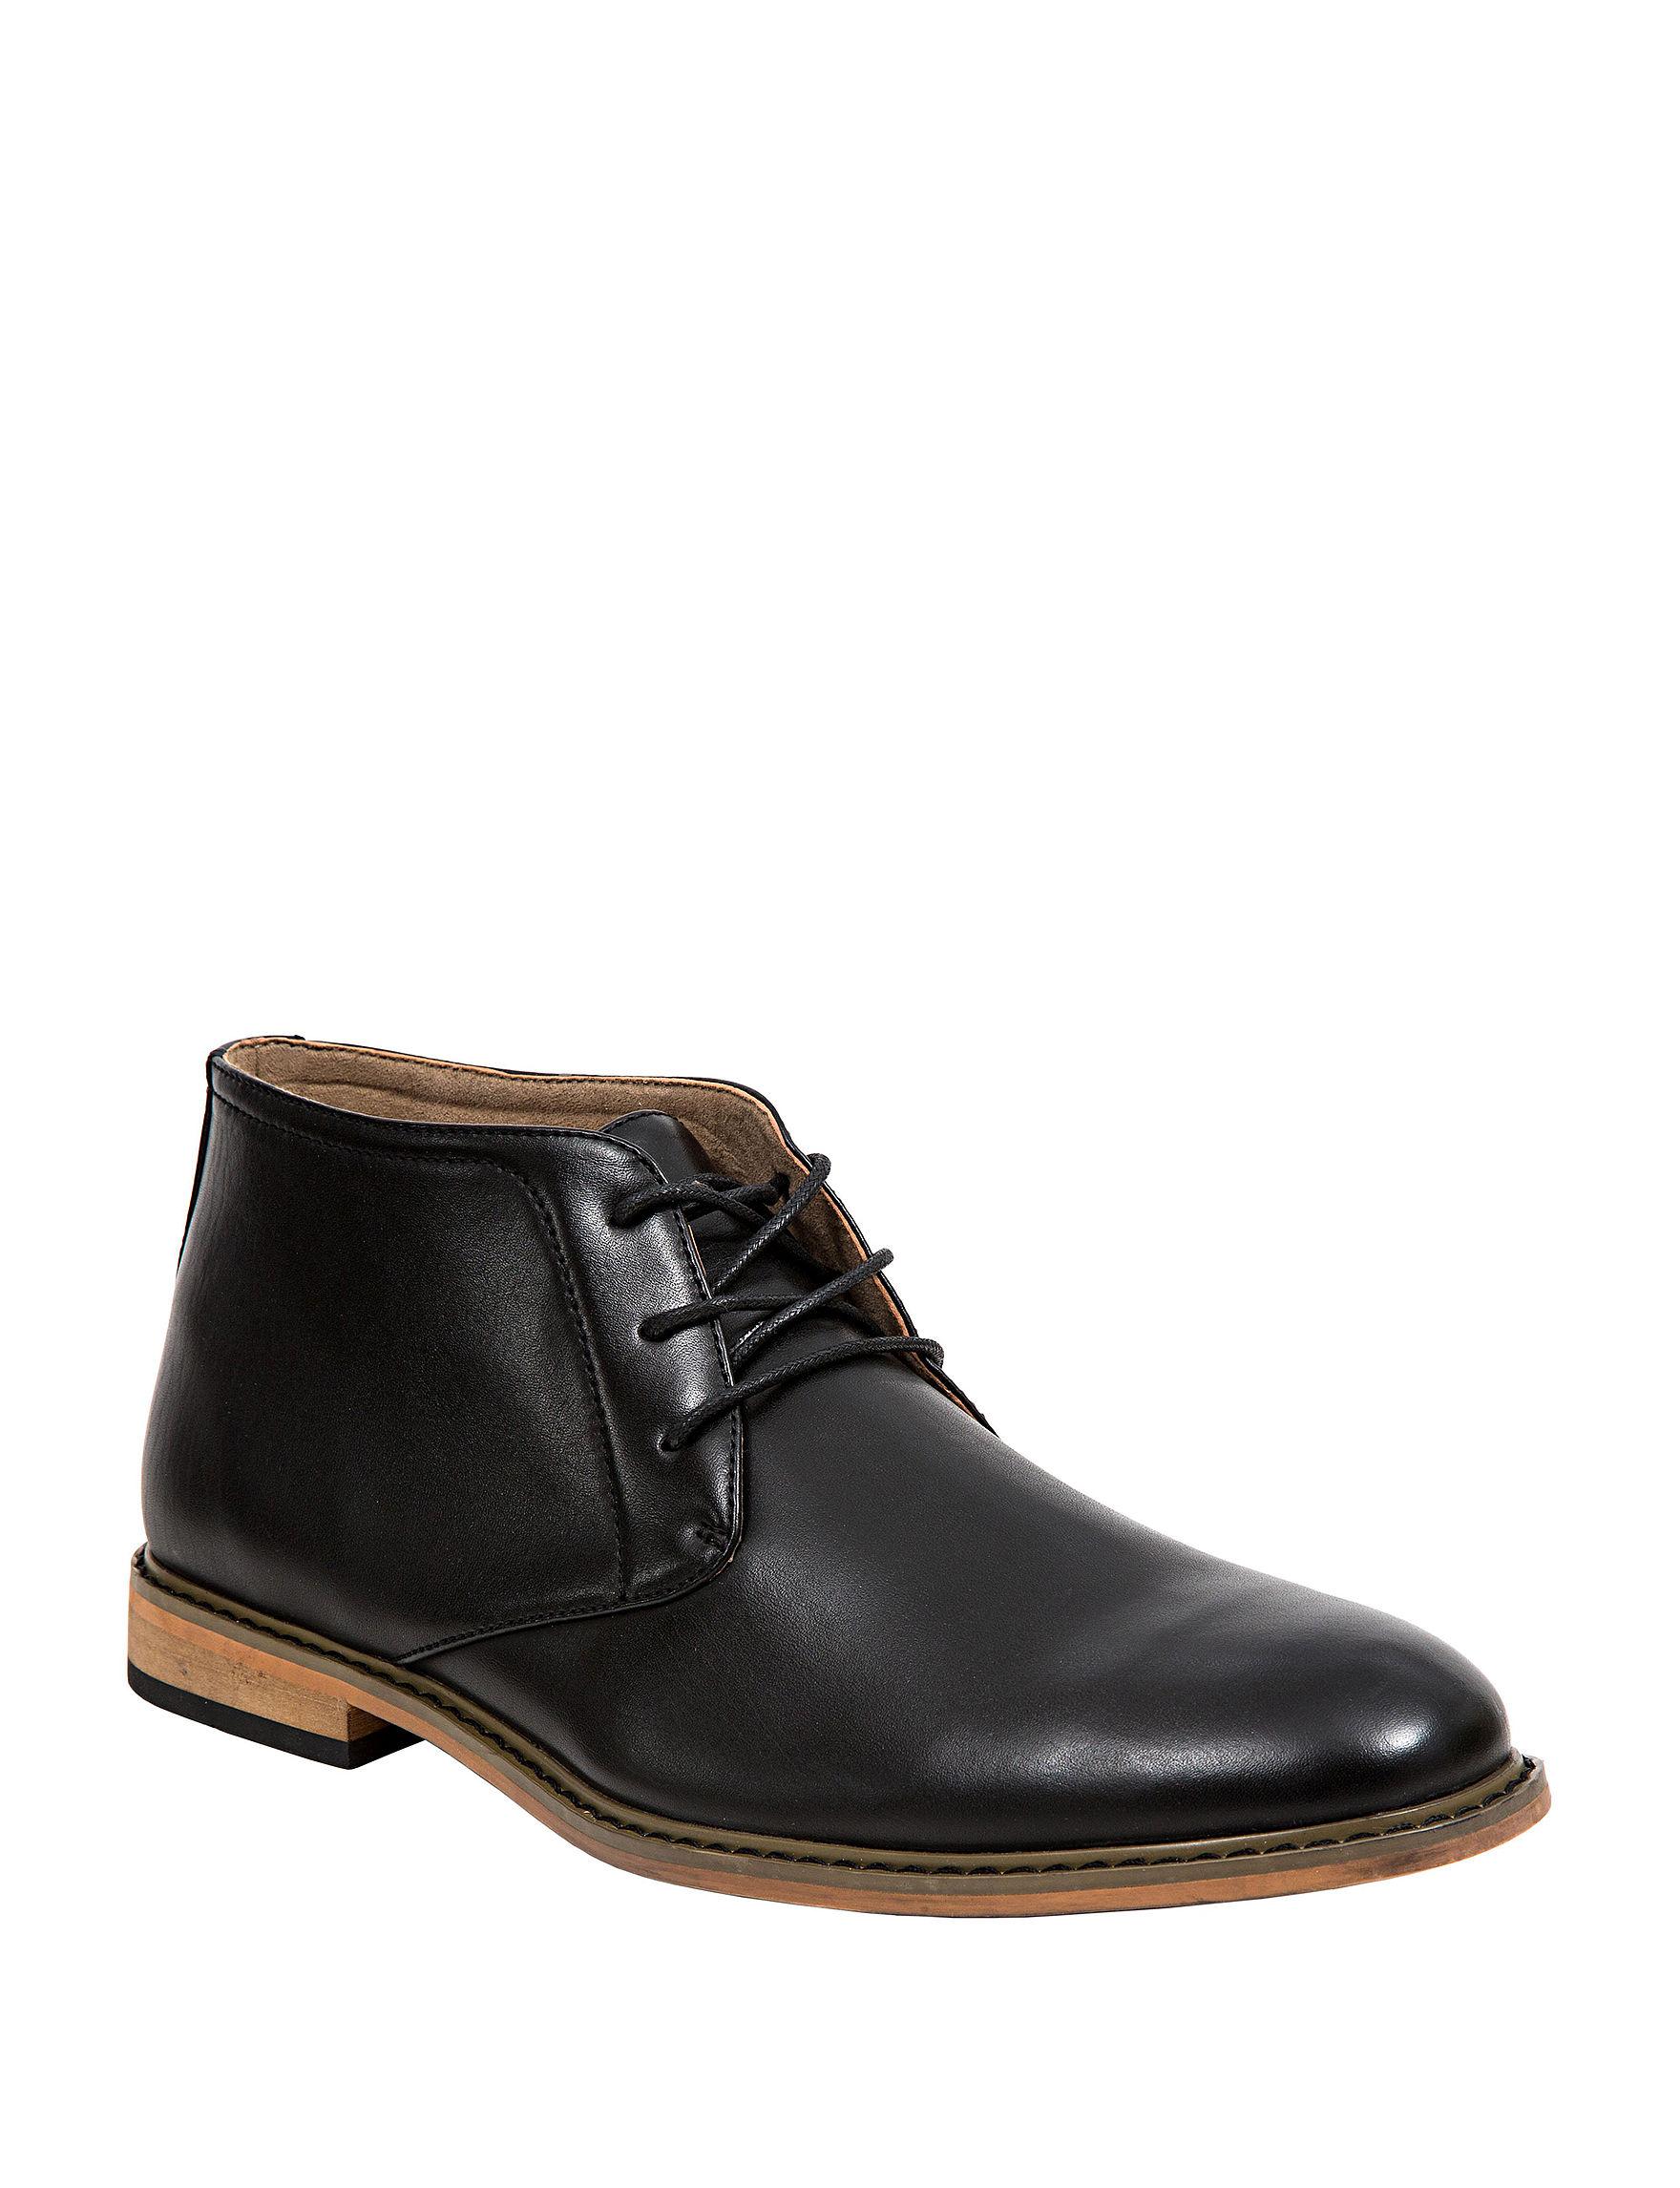 Deer Stags Black Chukka Boots